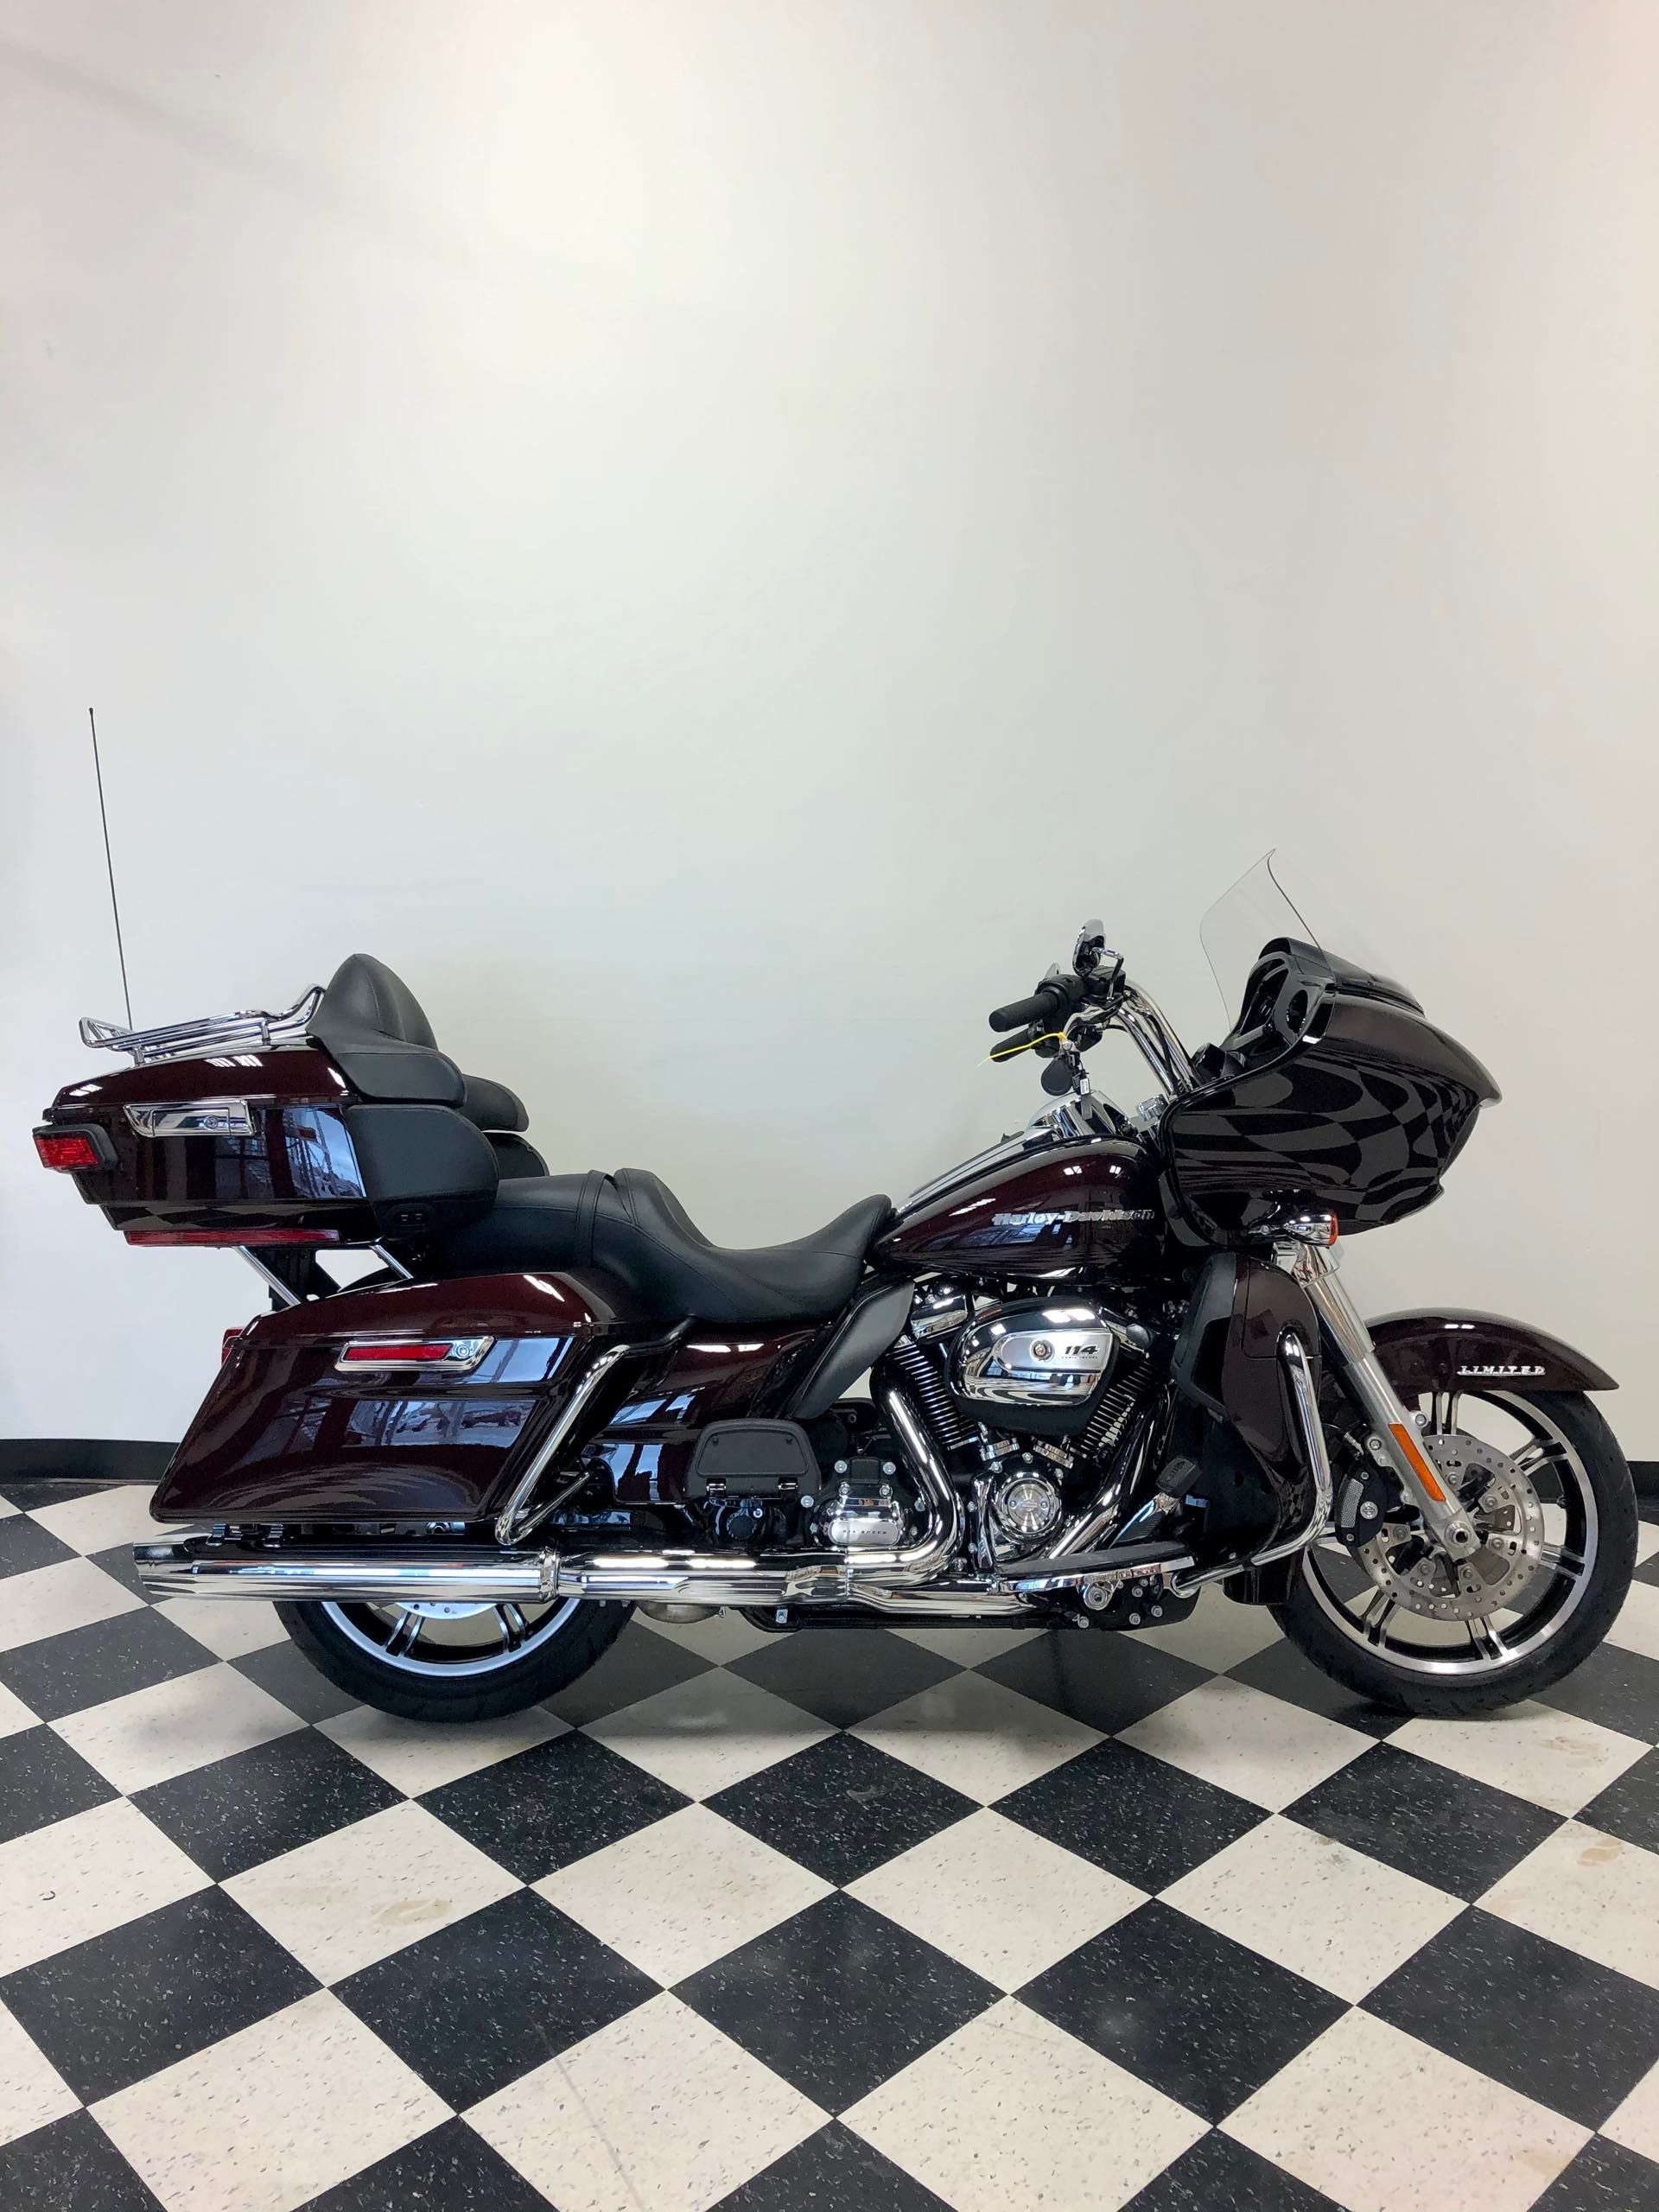 2021 Harley-Davidson FLTRK at Deluxe Harley Davidson